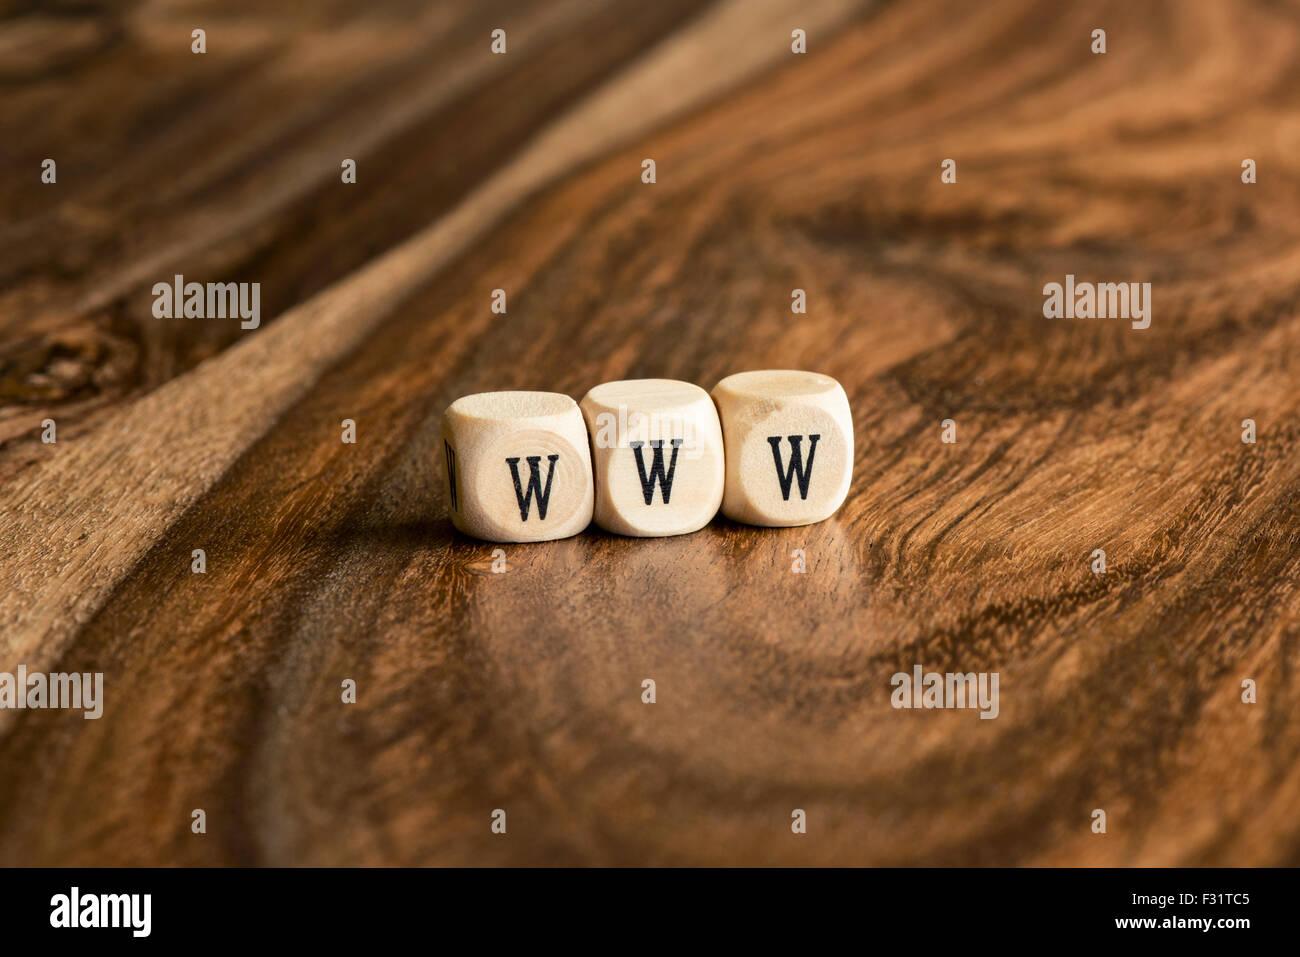 WWW word background on wood blocks - Stock Image